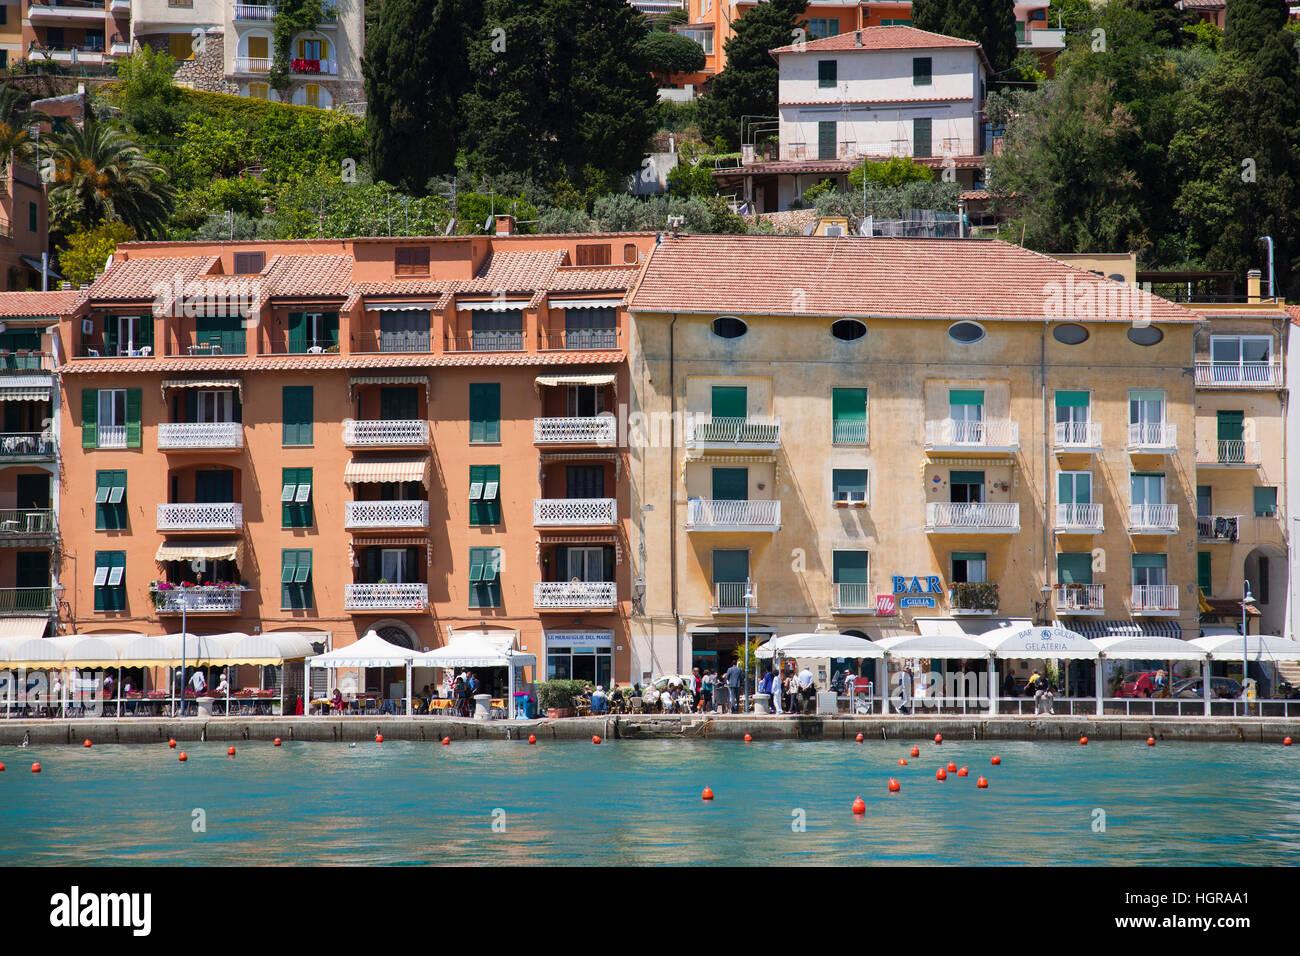 Promenade, Porto Santo Stefano, Argentario, Tuscany, Italy, Europe - Stock Image